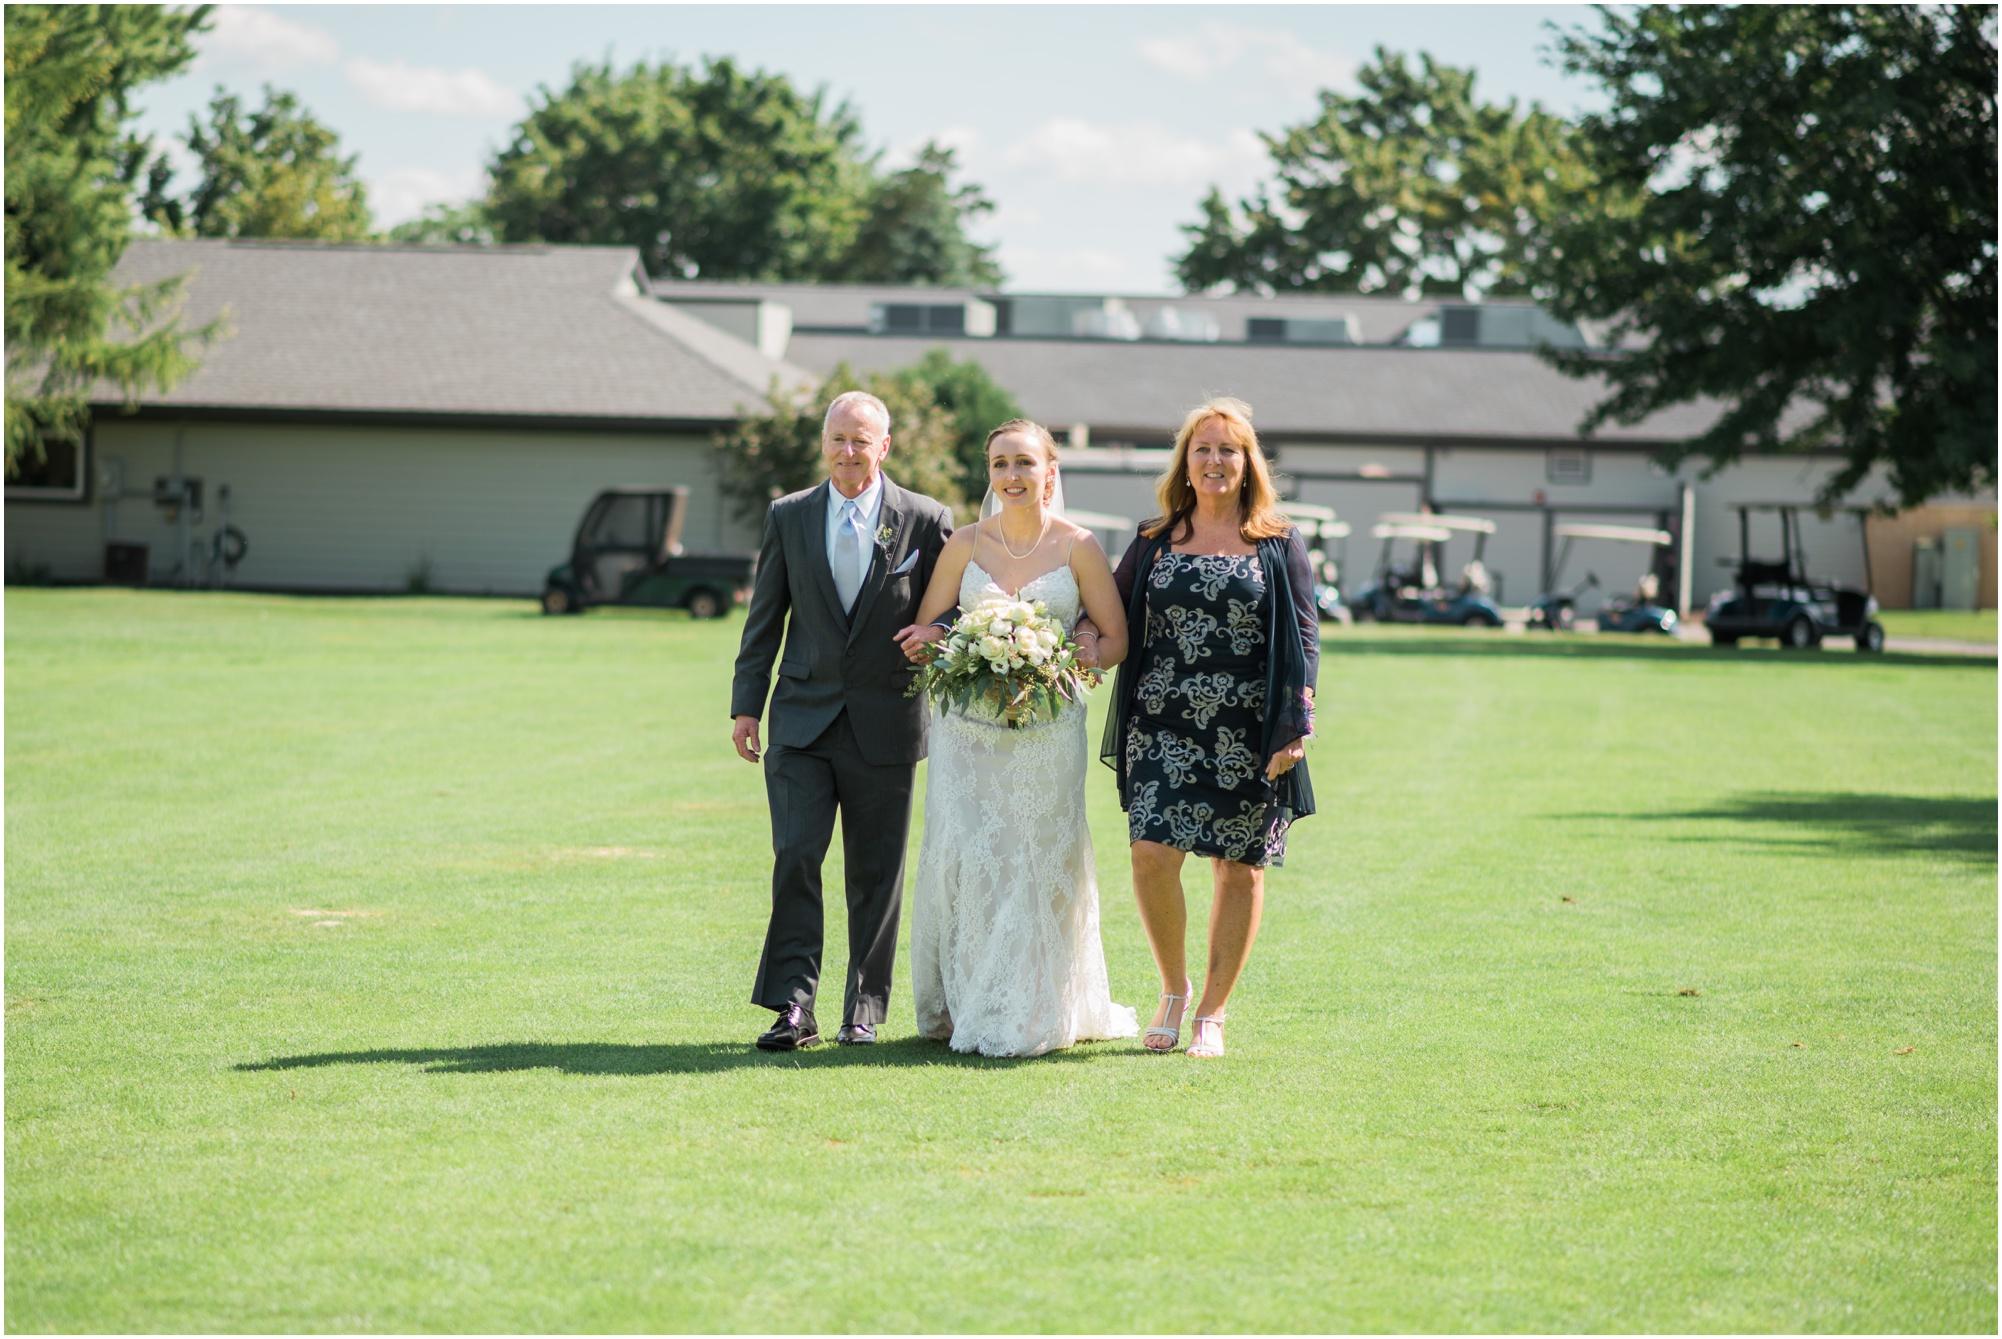 Wisconsin-Wedding-Photographer-Reedsburg-Country-Club-Kaela-and Matt-Wedding-414.jpg